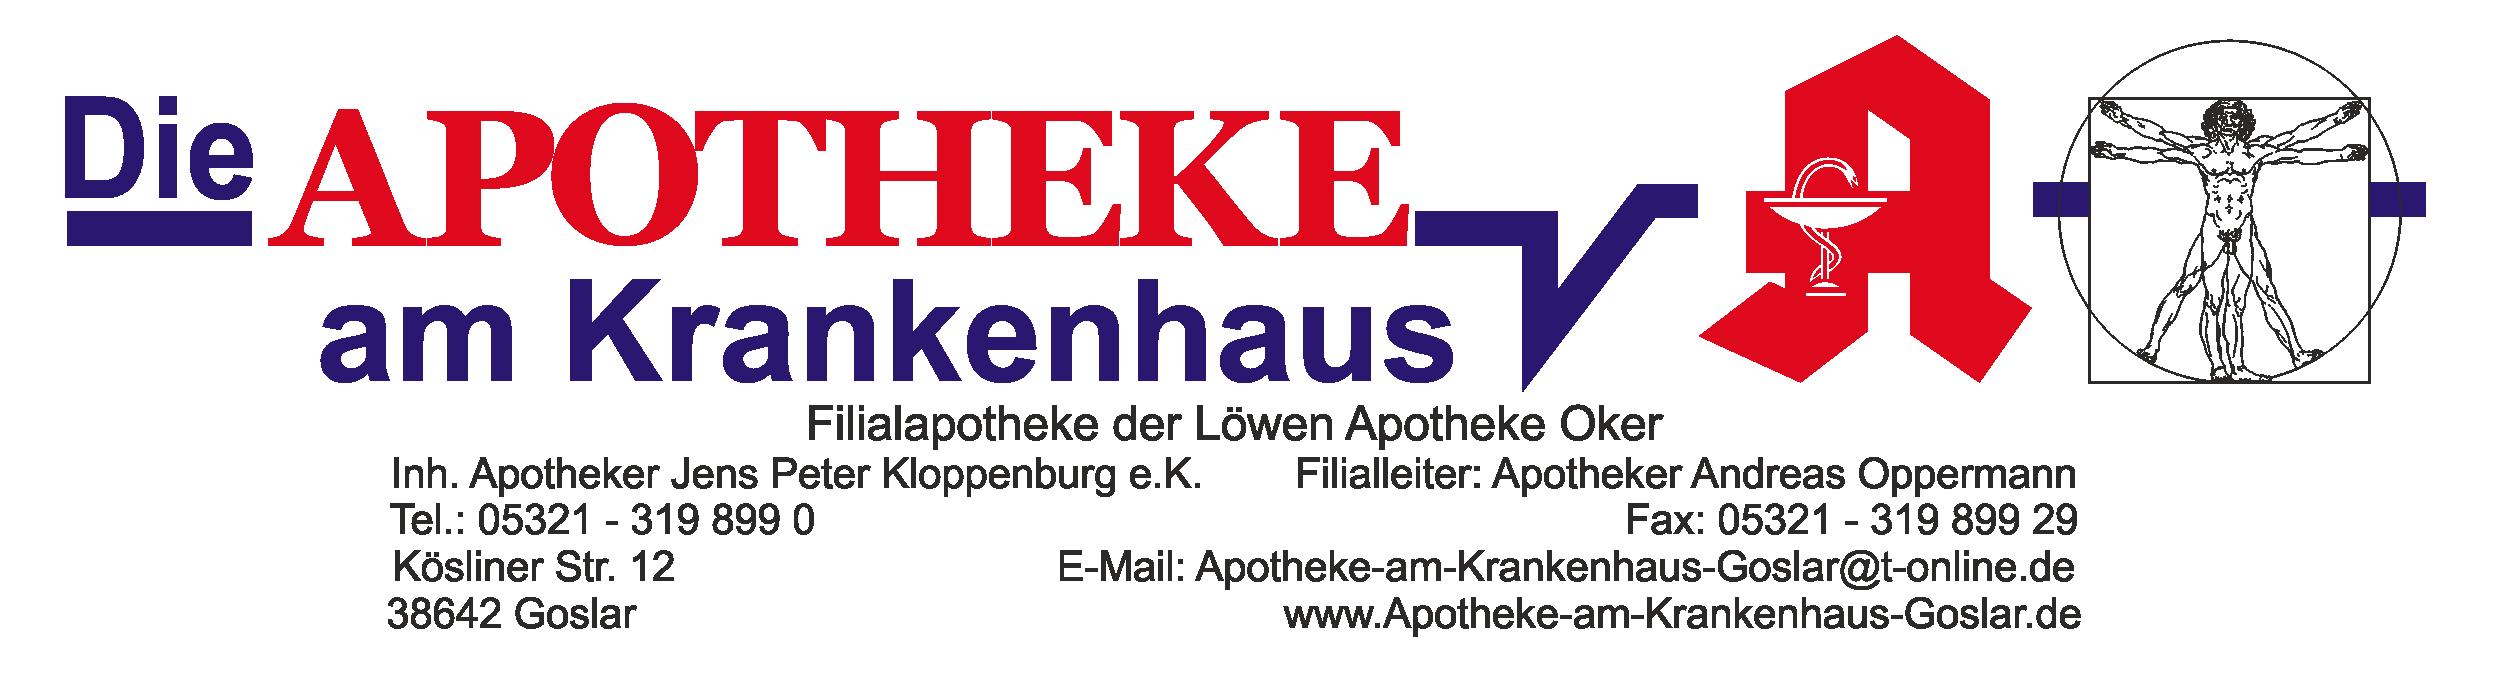 Logo der Apotheke am Krankenhaus - Filialapotheke der Löwen Apotheke Oker